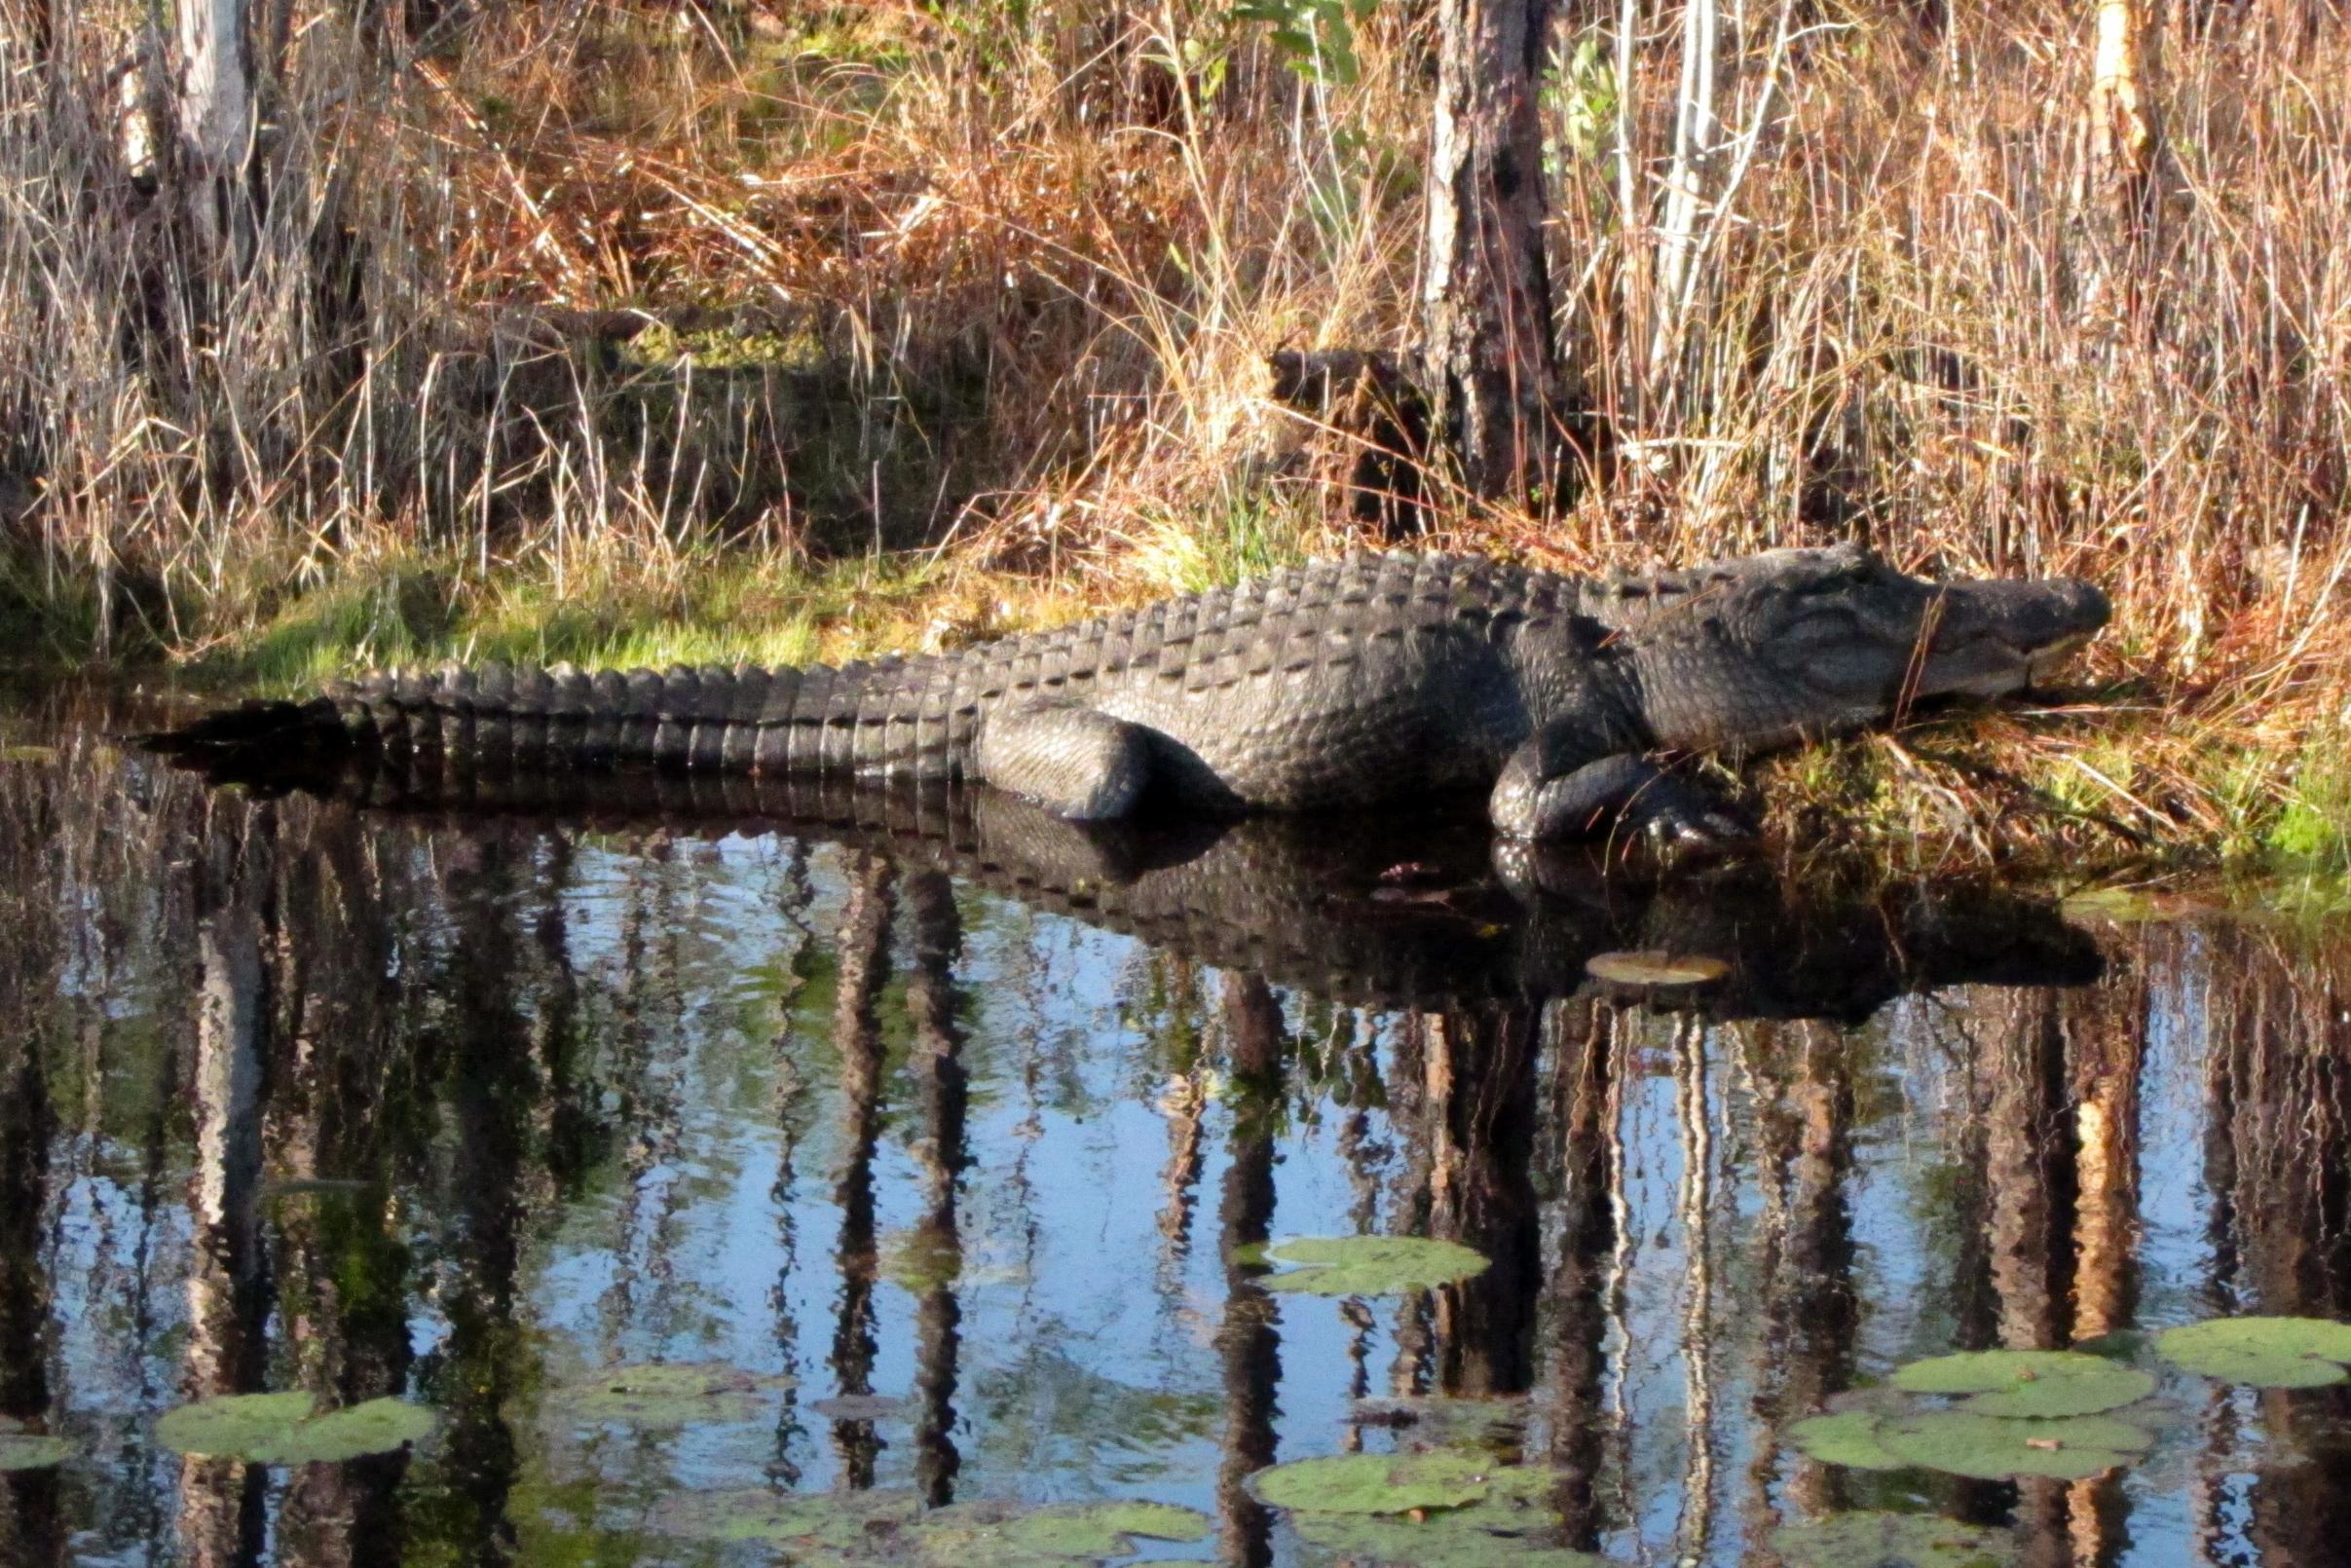 Okefenokee 'Gator